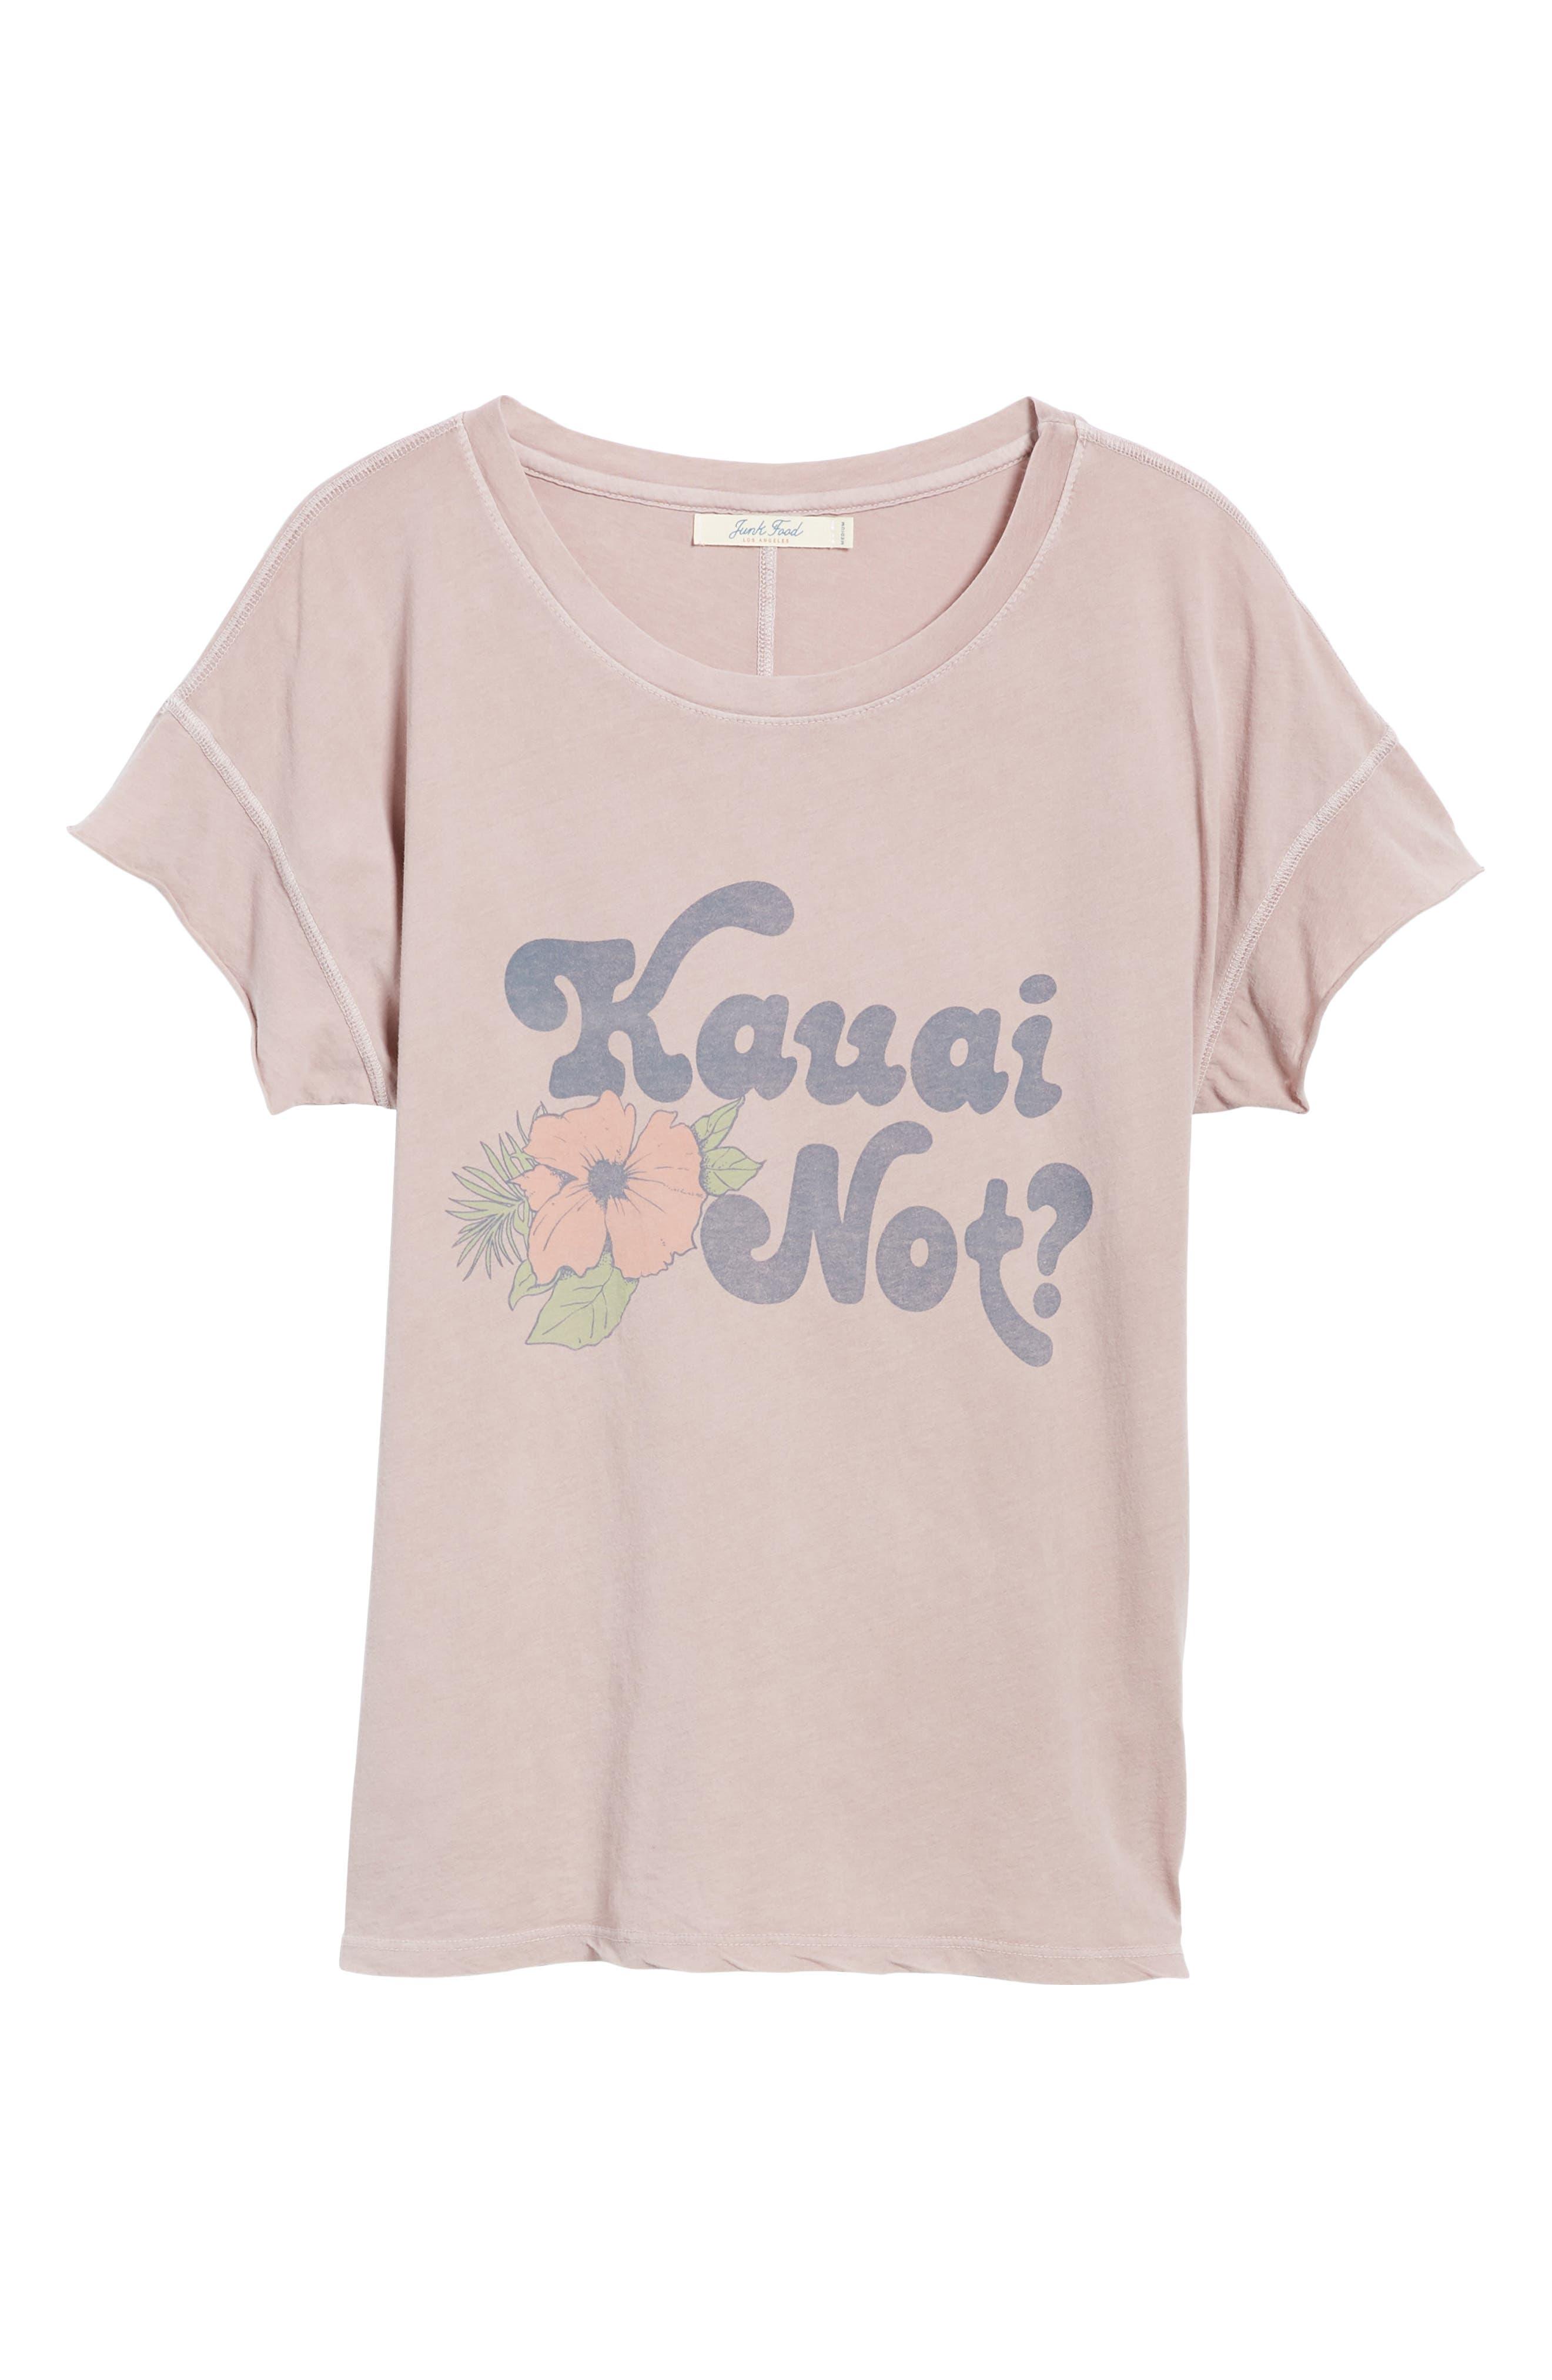 Kauai Not Tee,                             Alternate thumbnail 6, color,                             620